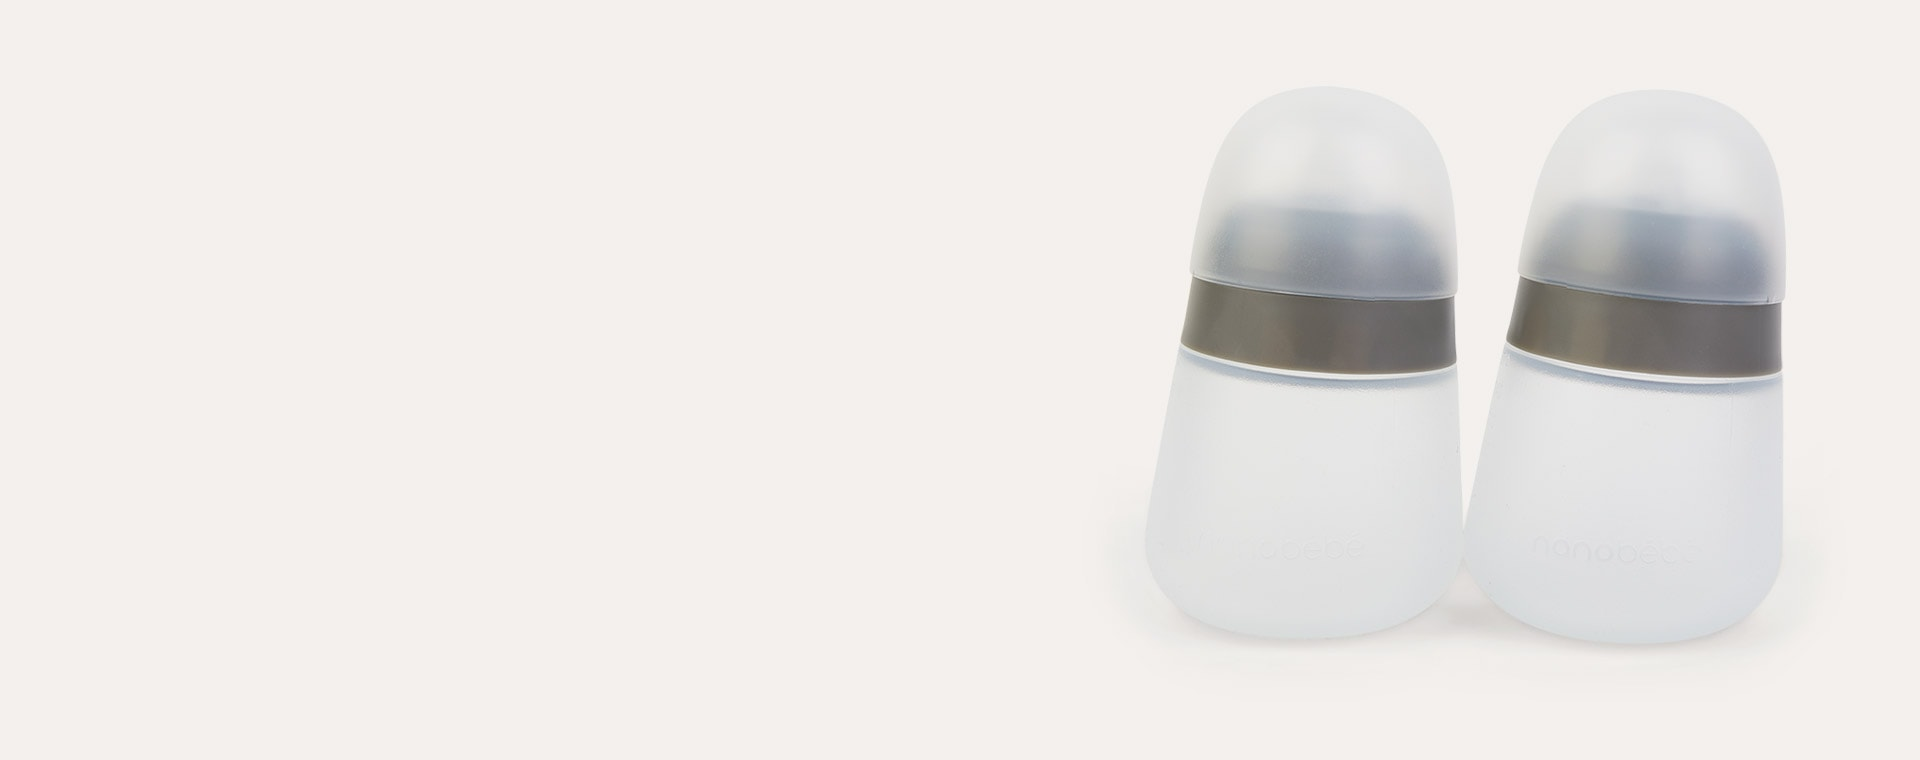 Grey nanobébé 2-Pack Flexy Silicone Baby Bottles